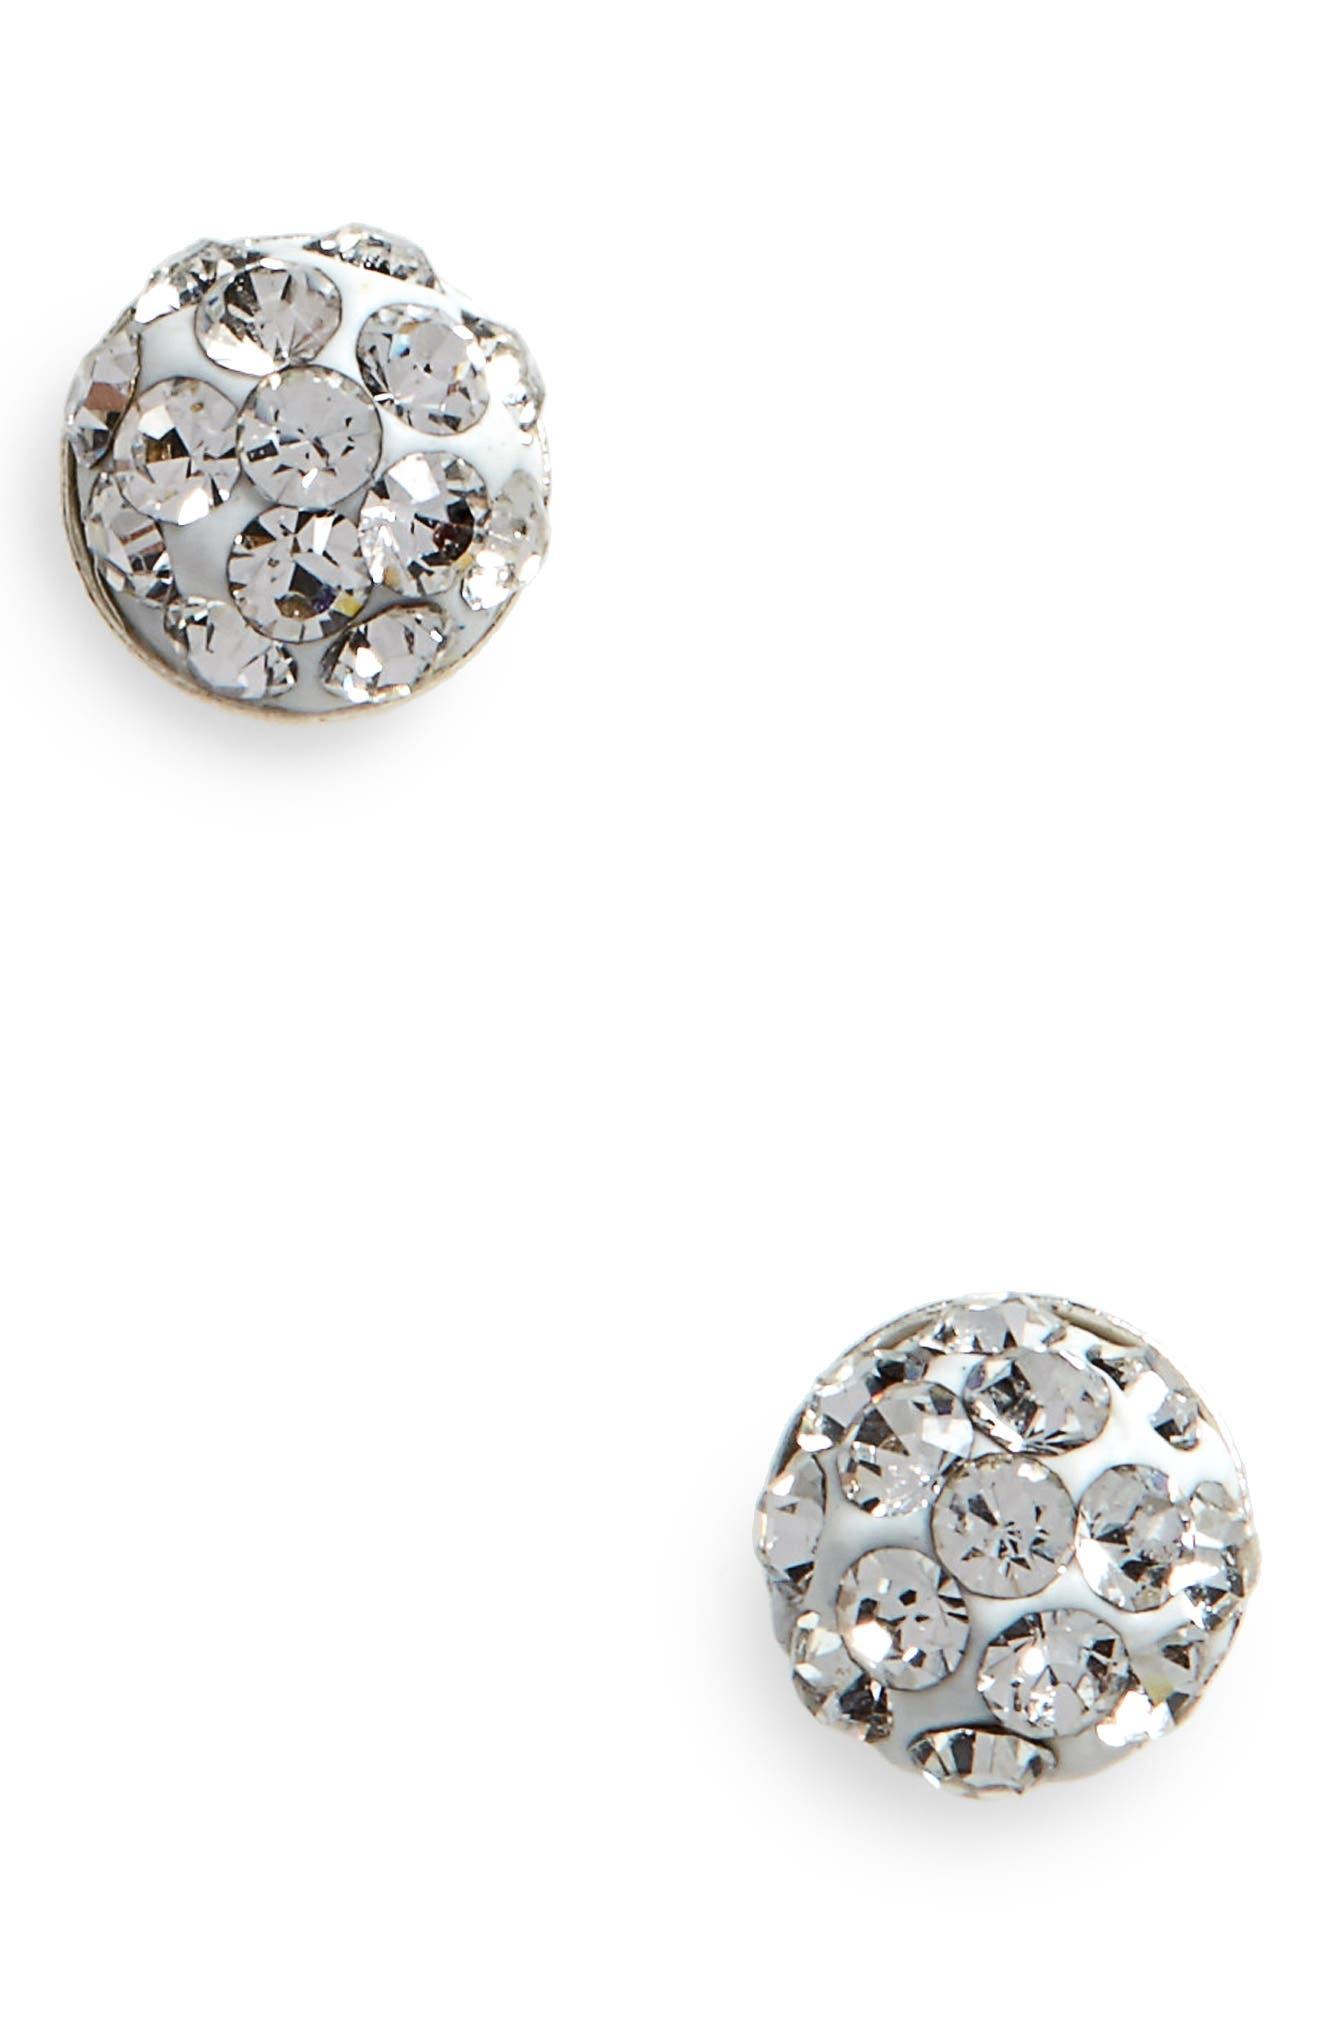 Crystal & Sterling Silver Stud Earrings,                         Main,                         color, Silver